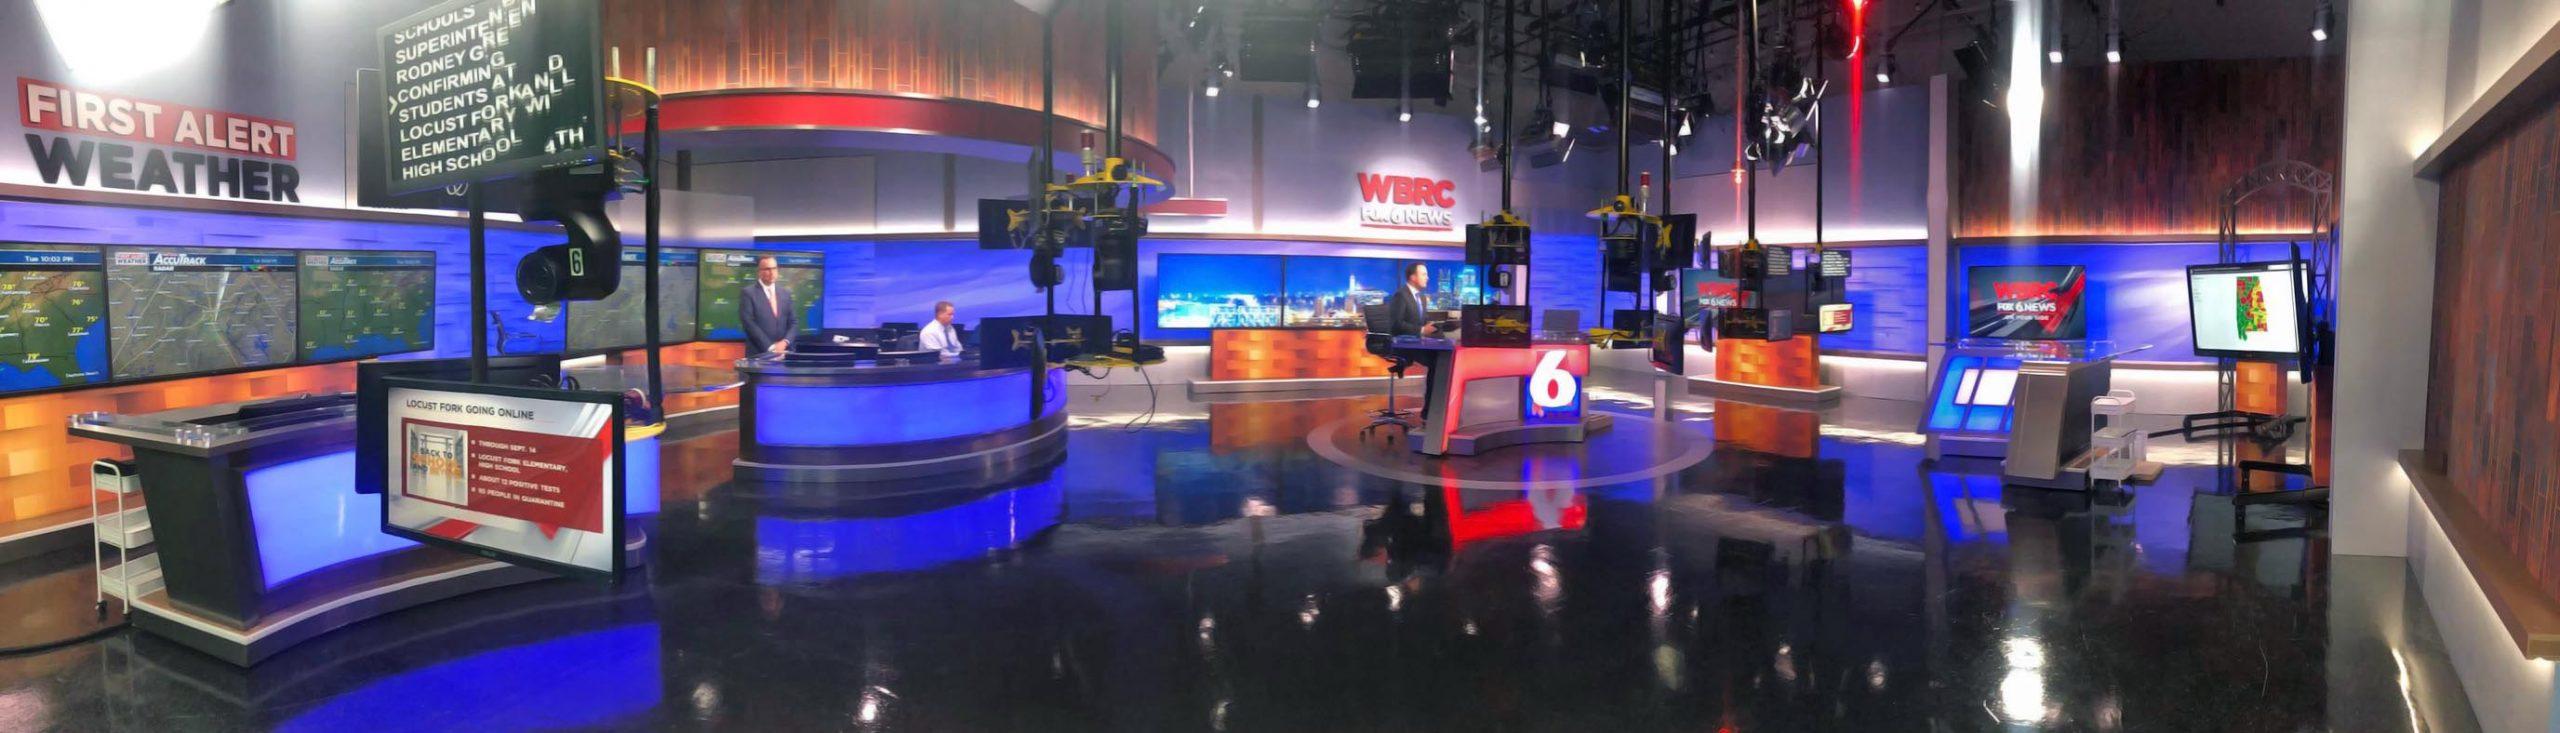 WBRC 6 News live streaming studio